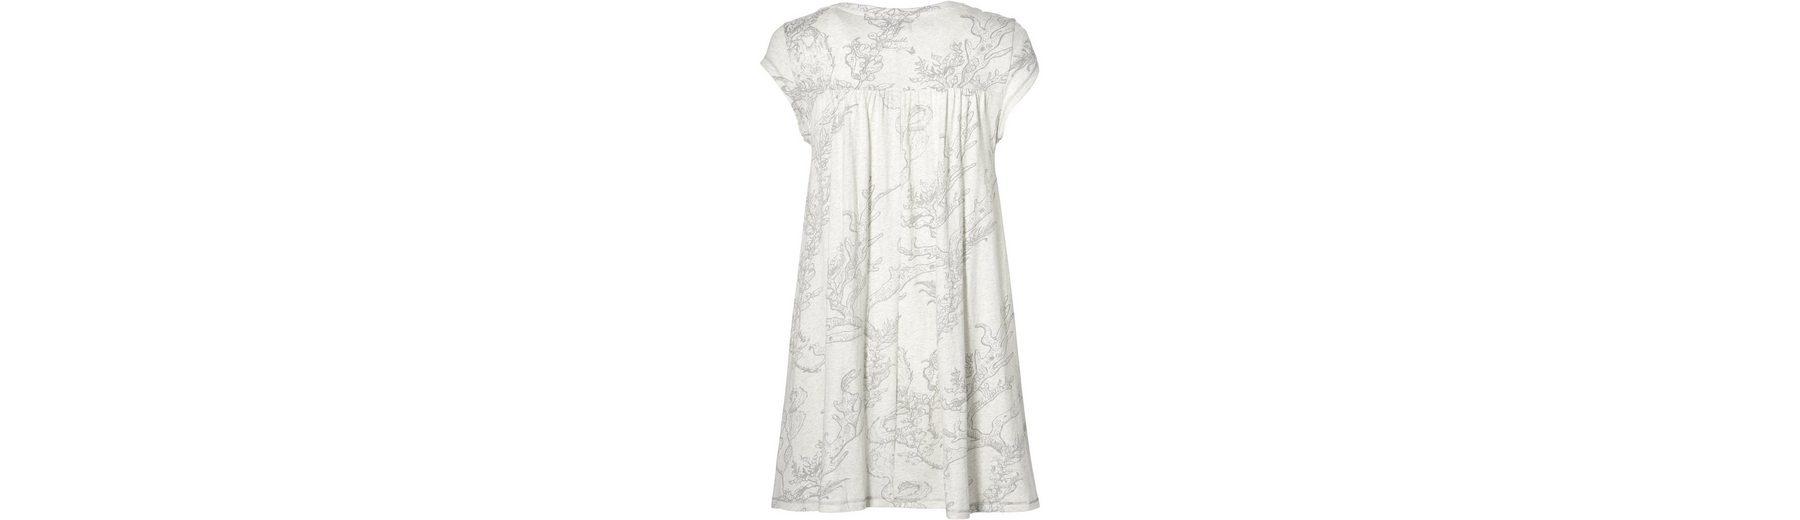 Manchester O'Neill Kleid mini Marissa Freies Verschiffen Versorgung zZshJoc